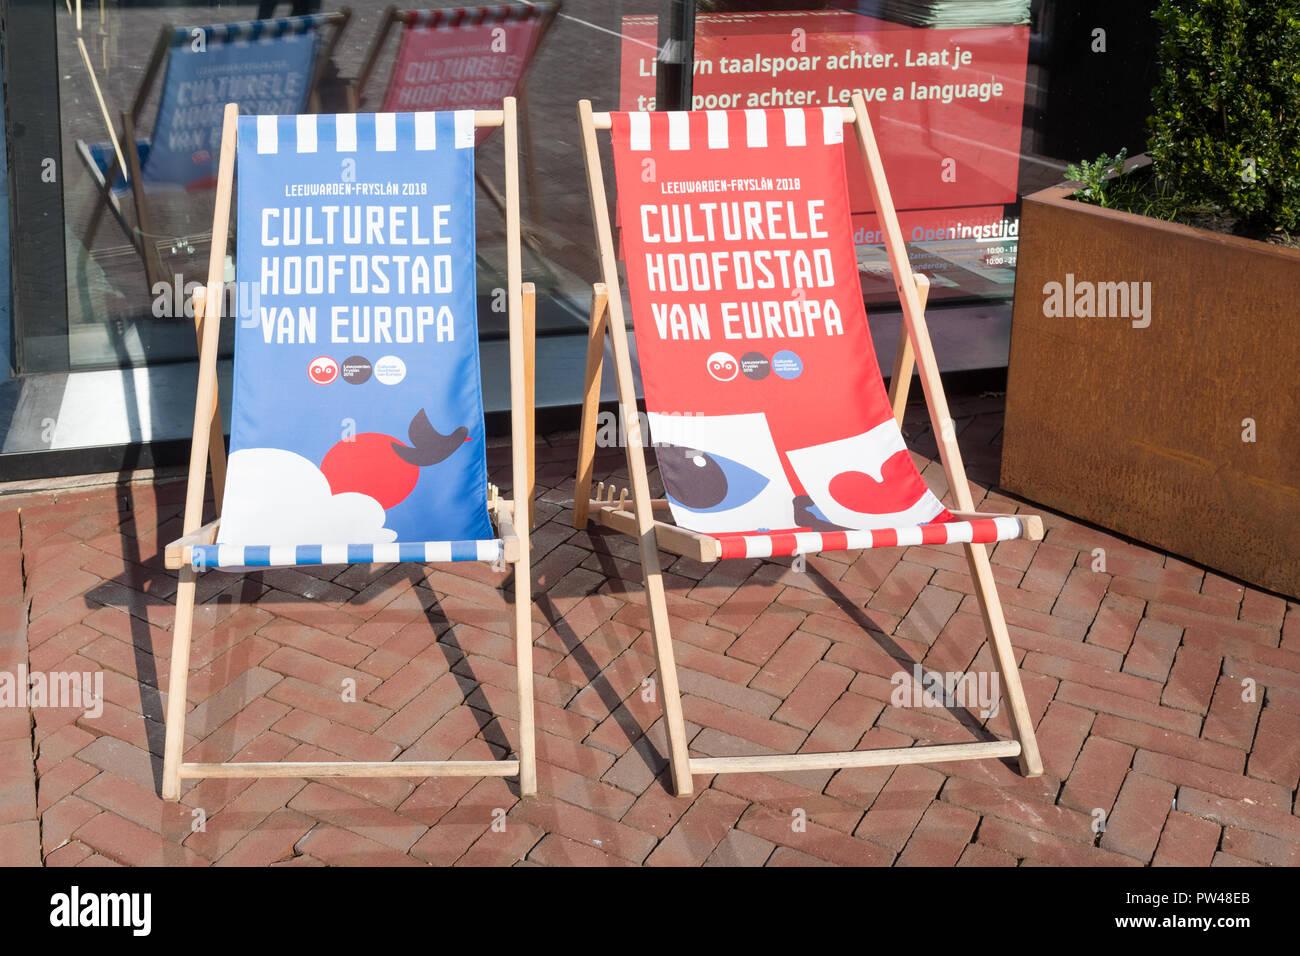 Leeuwarden, Friesland, Niederlande - Europäische Kulturhauptstadt 2018 - logo Liegestühle Stockbild